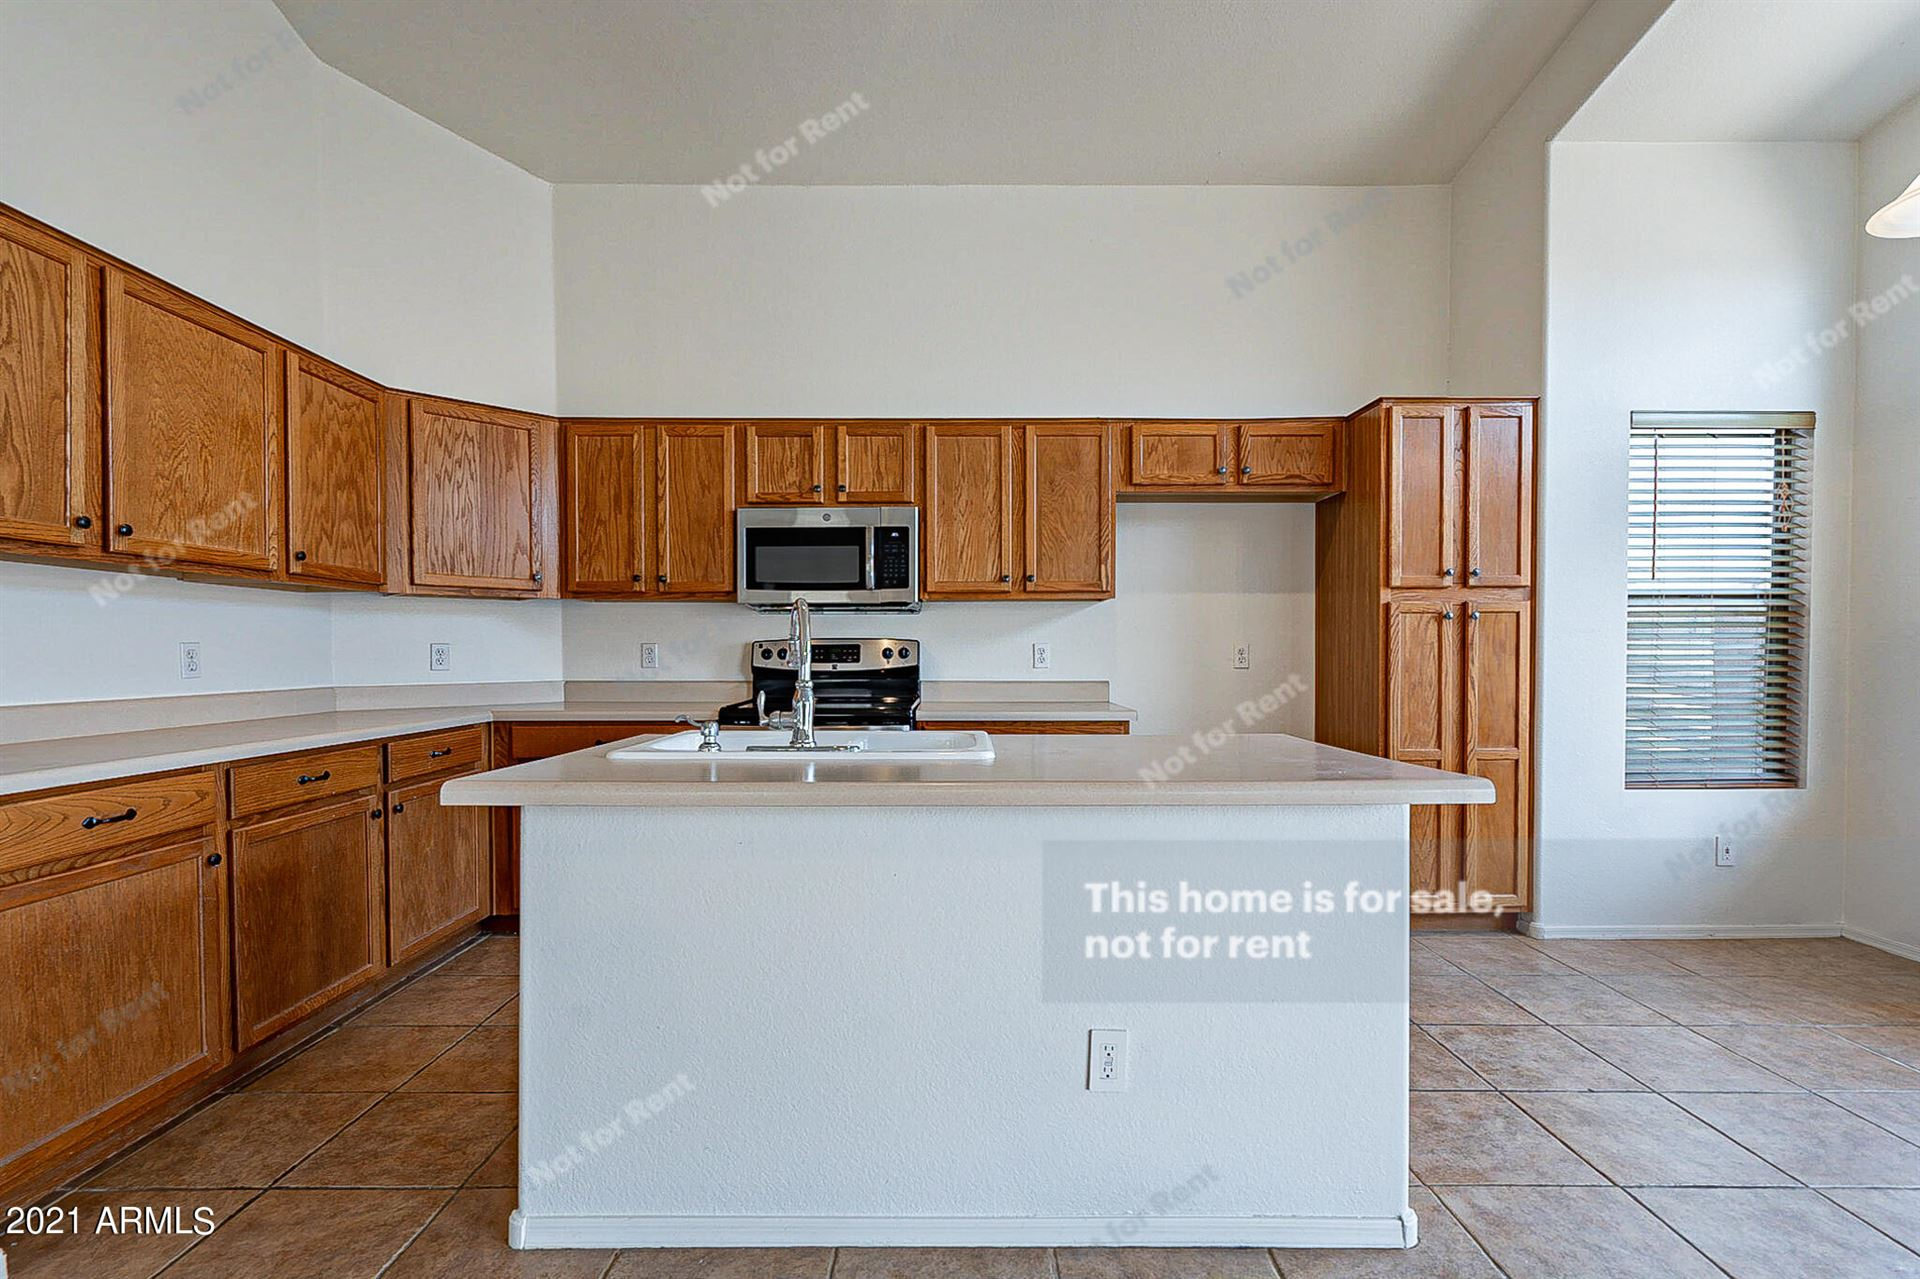 Photo of 1034 E PIMA Avenue, Apache Junction, AZ 85119 (MLS # 6289584)